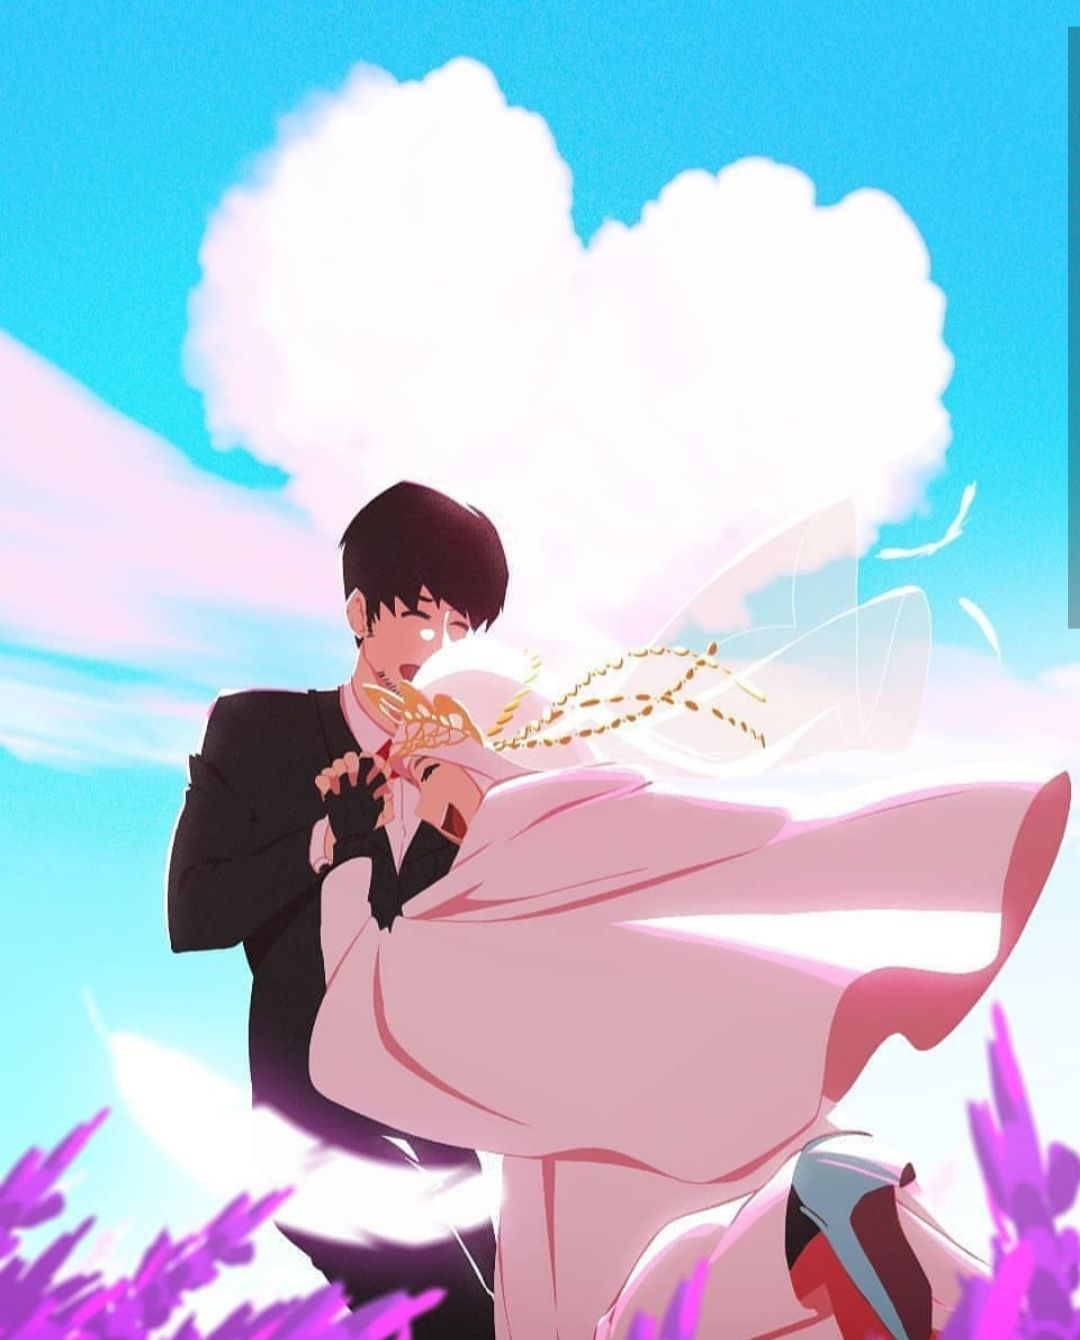 Cinta Beda Agama ( Fanfic ) di 2020 Seni anime, Seni